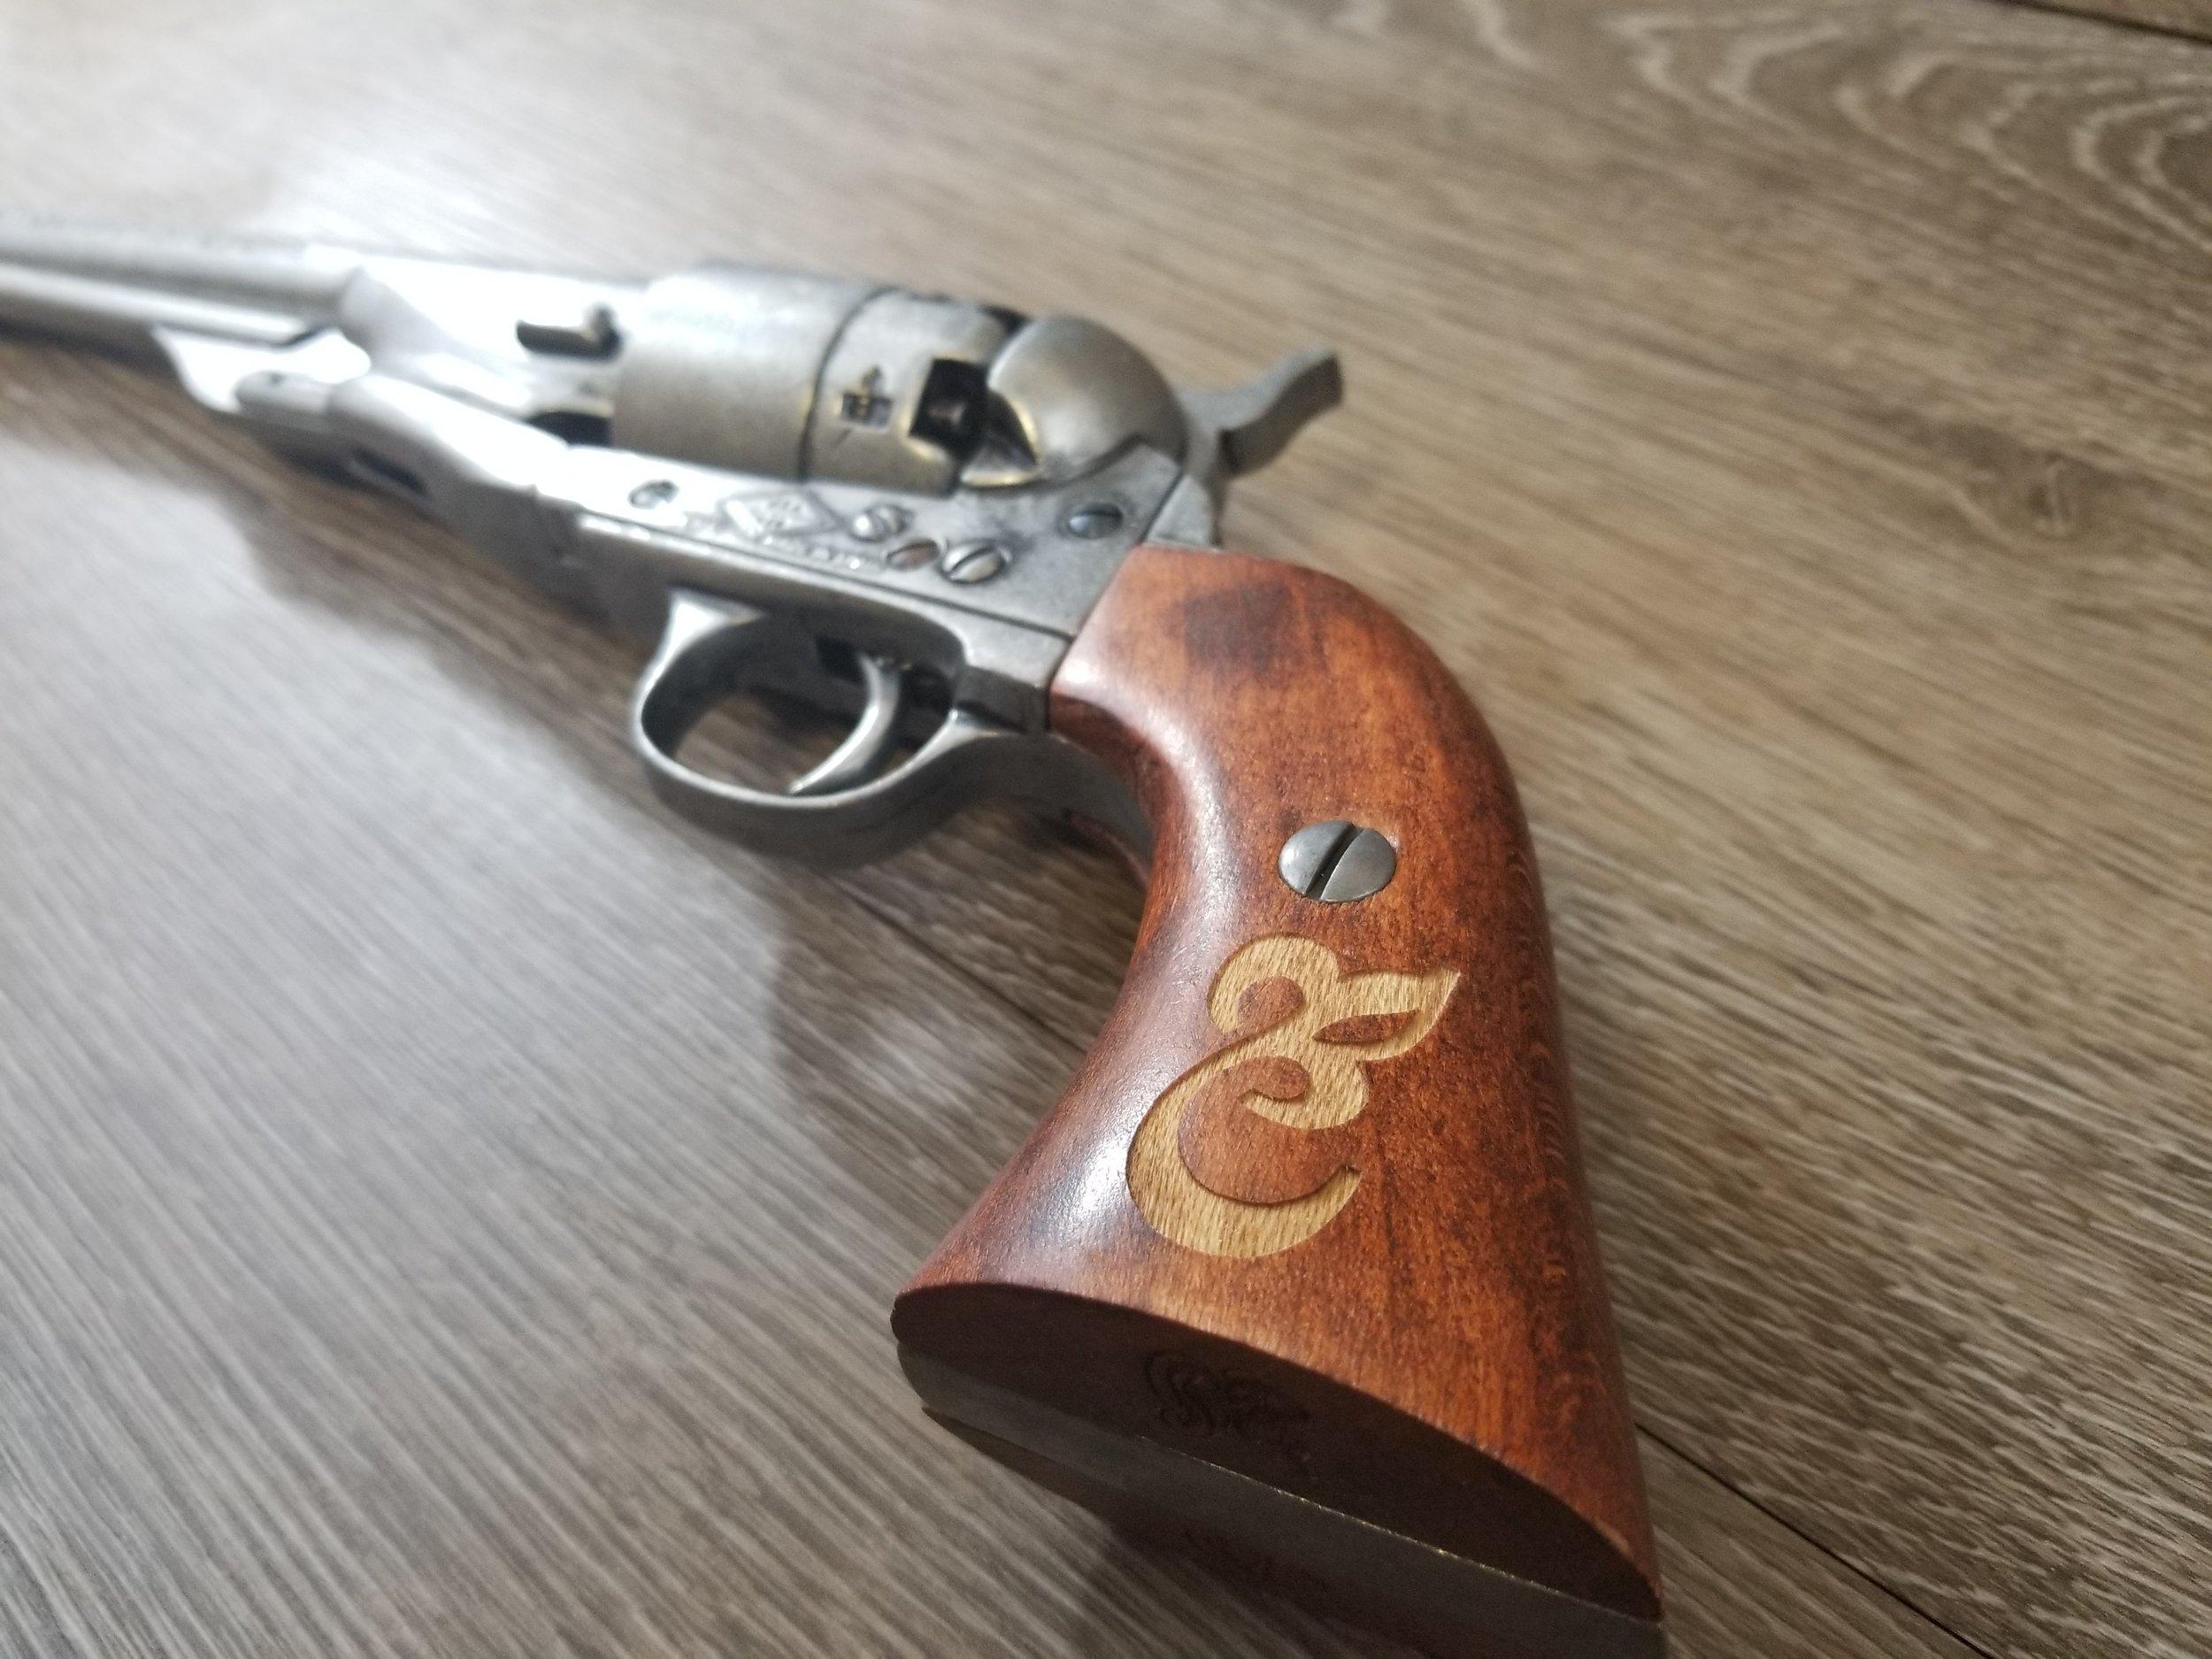 Custom Engraved Pistol Grip - Firearm Projects from Engrave It Houston